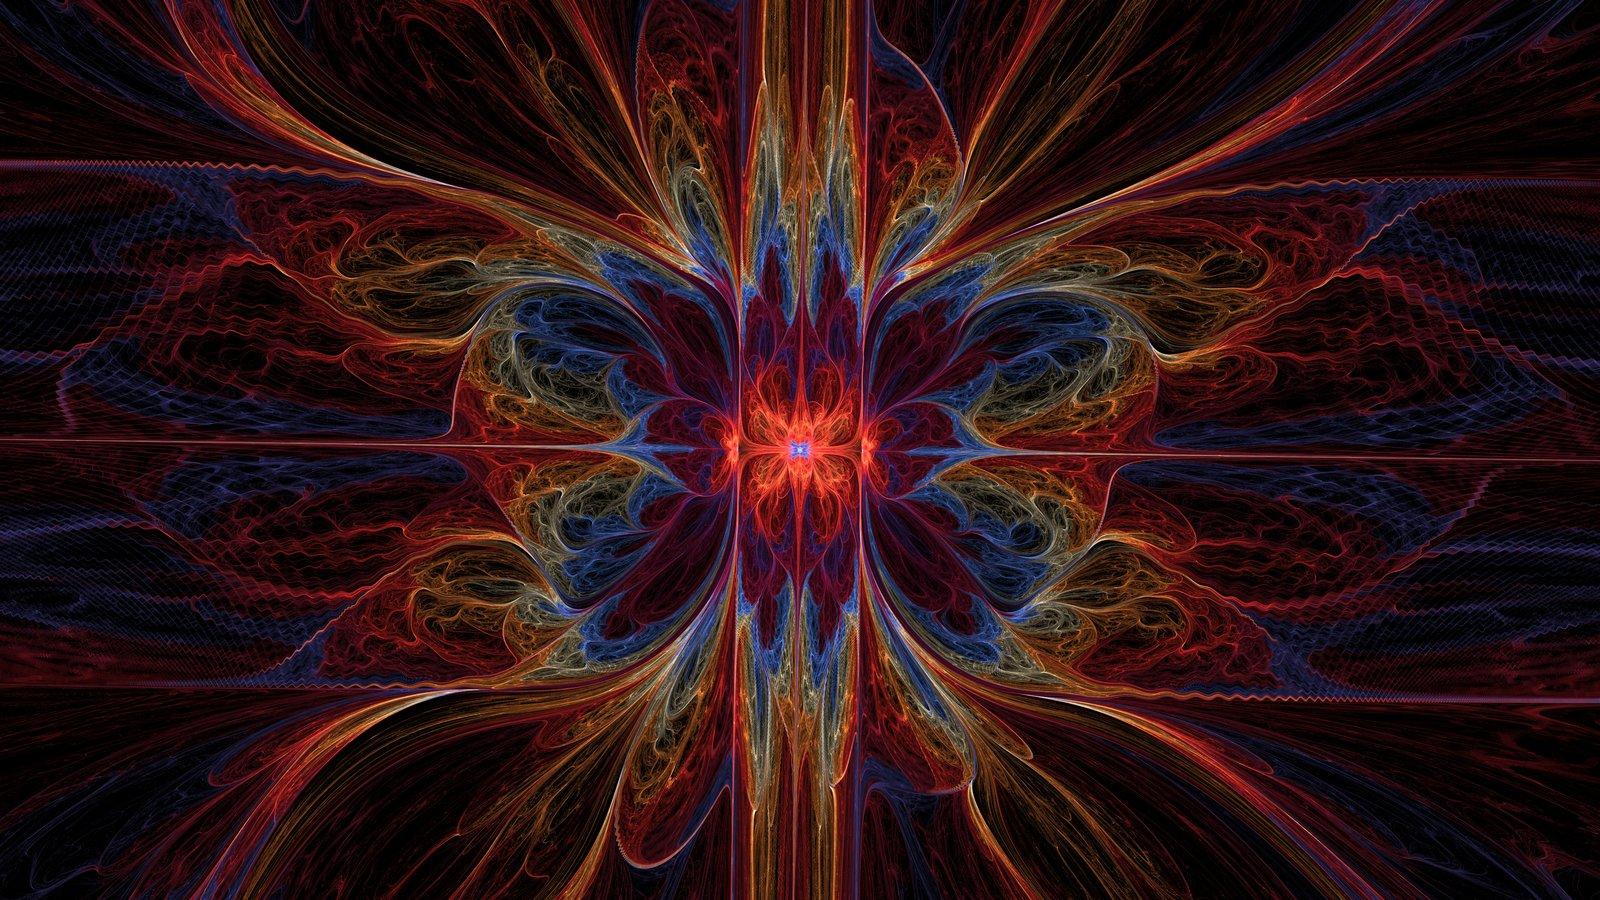 artistdeviantartcomartPsychedelic Emination HD Wallpaper 316601614 1600x900